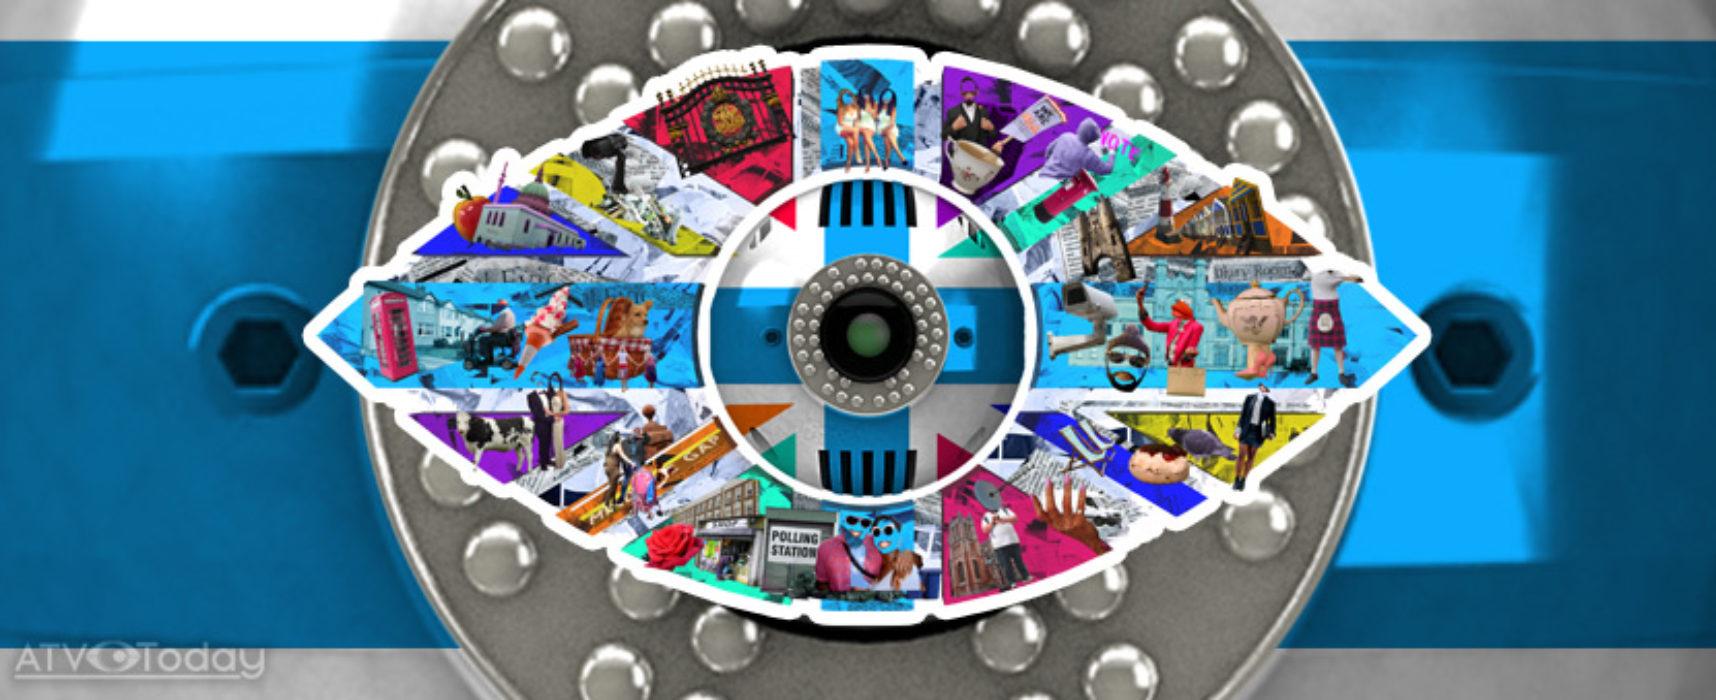 Channel 5 reveal a 'United Kingdom' inspired eye logo for summer 2017